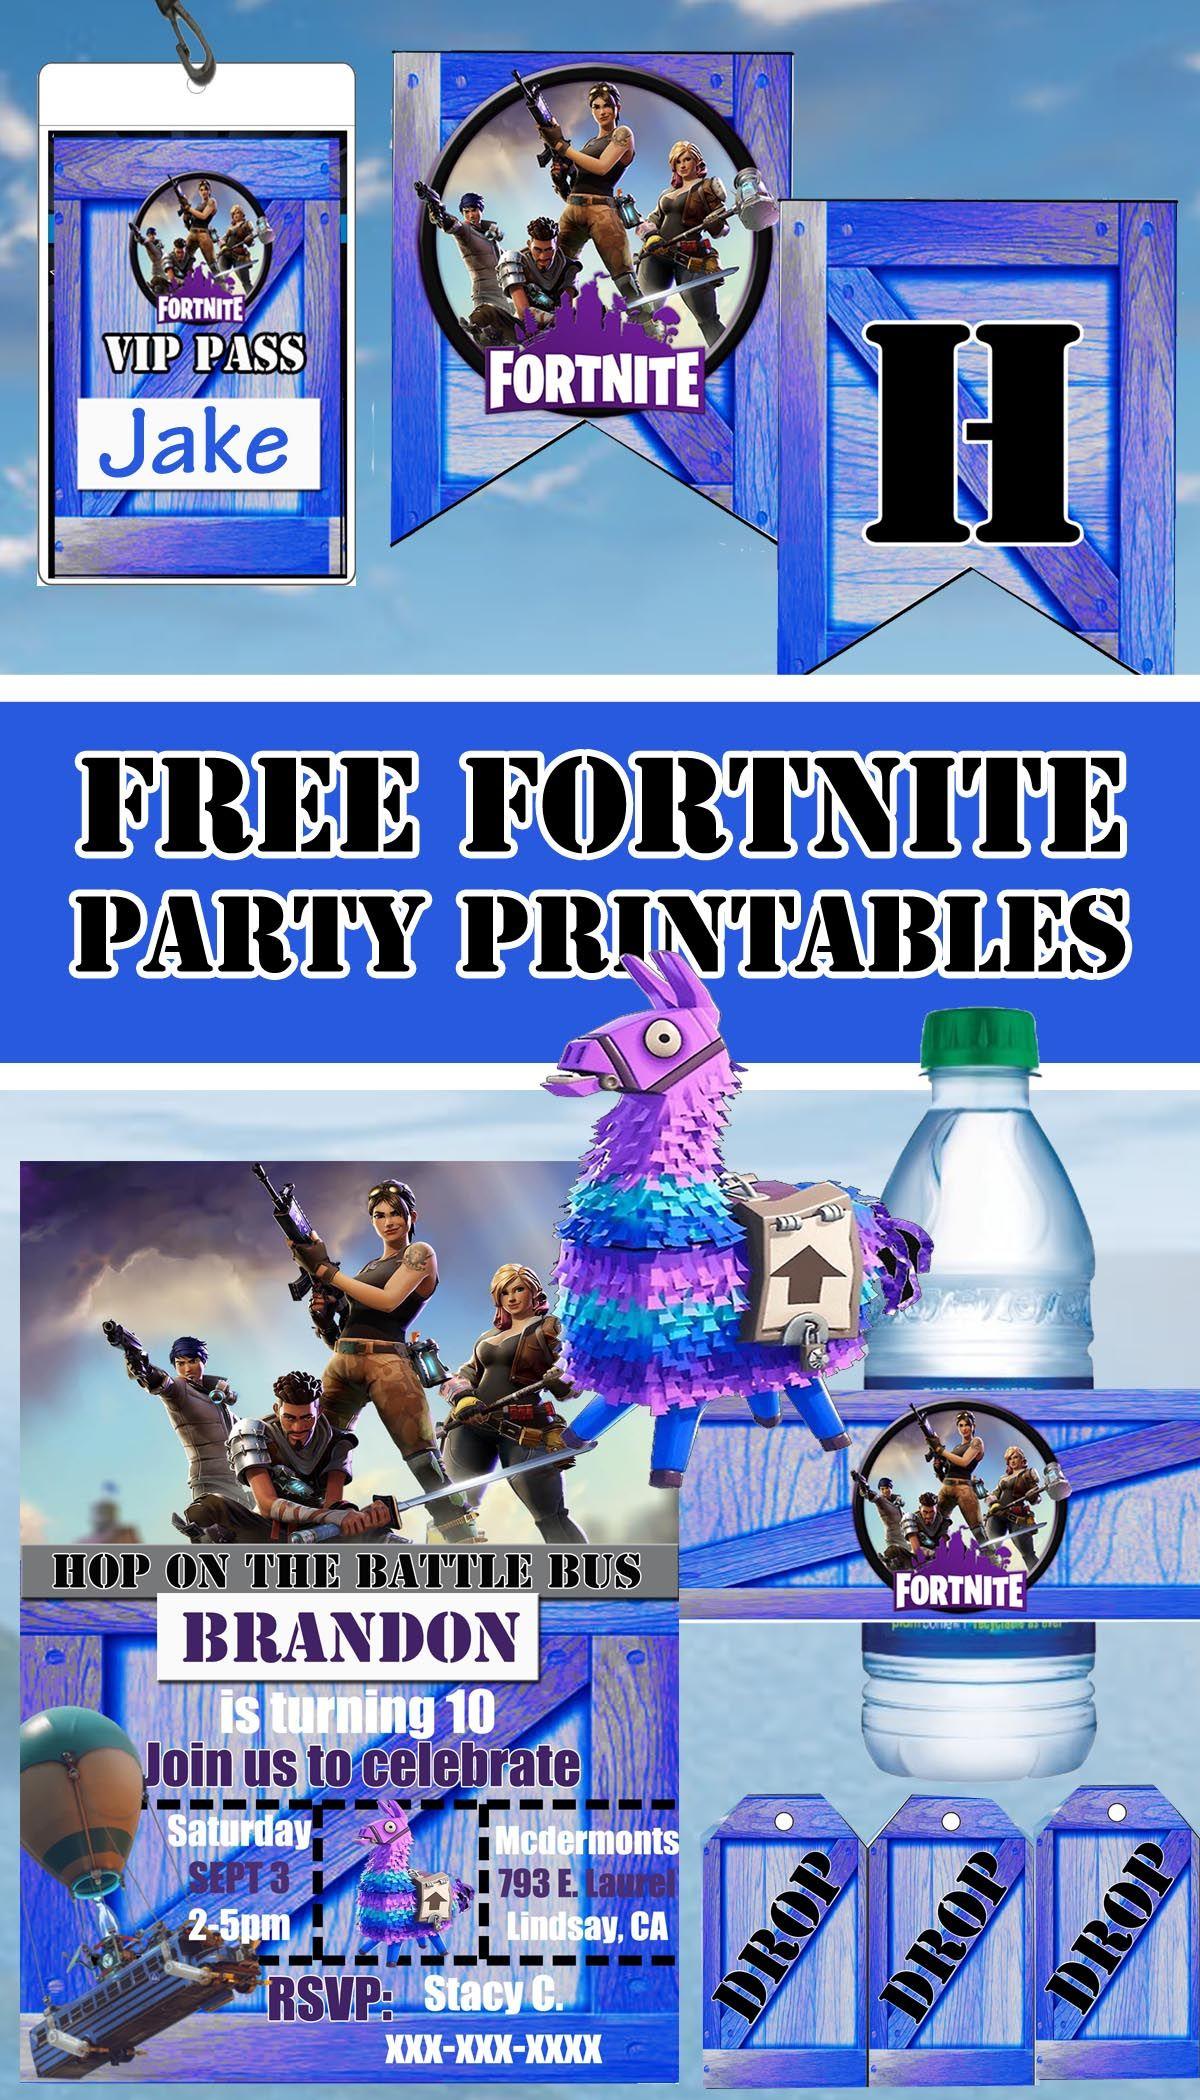 Fortnite Birthday Party Printables